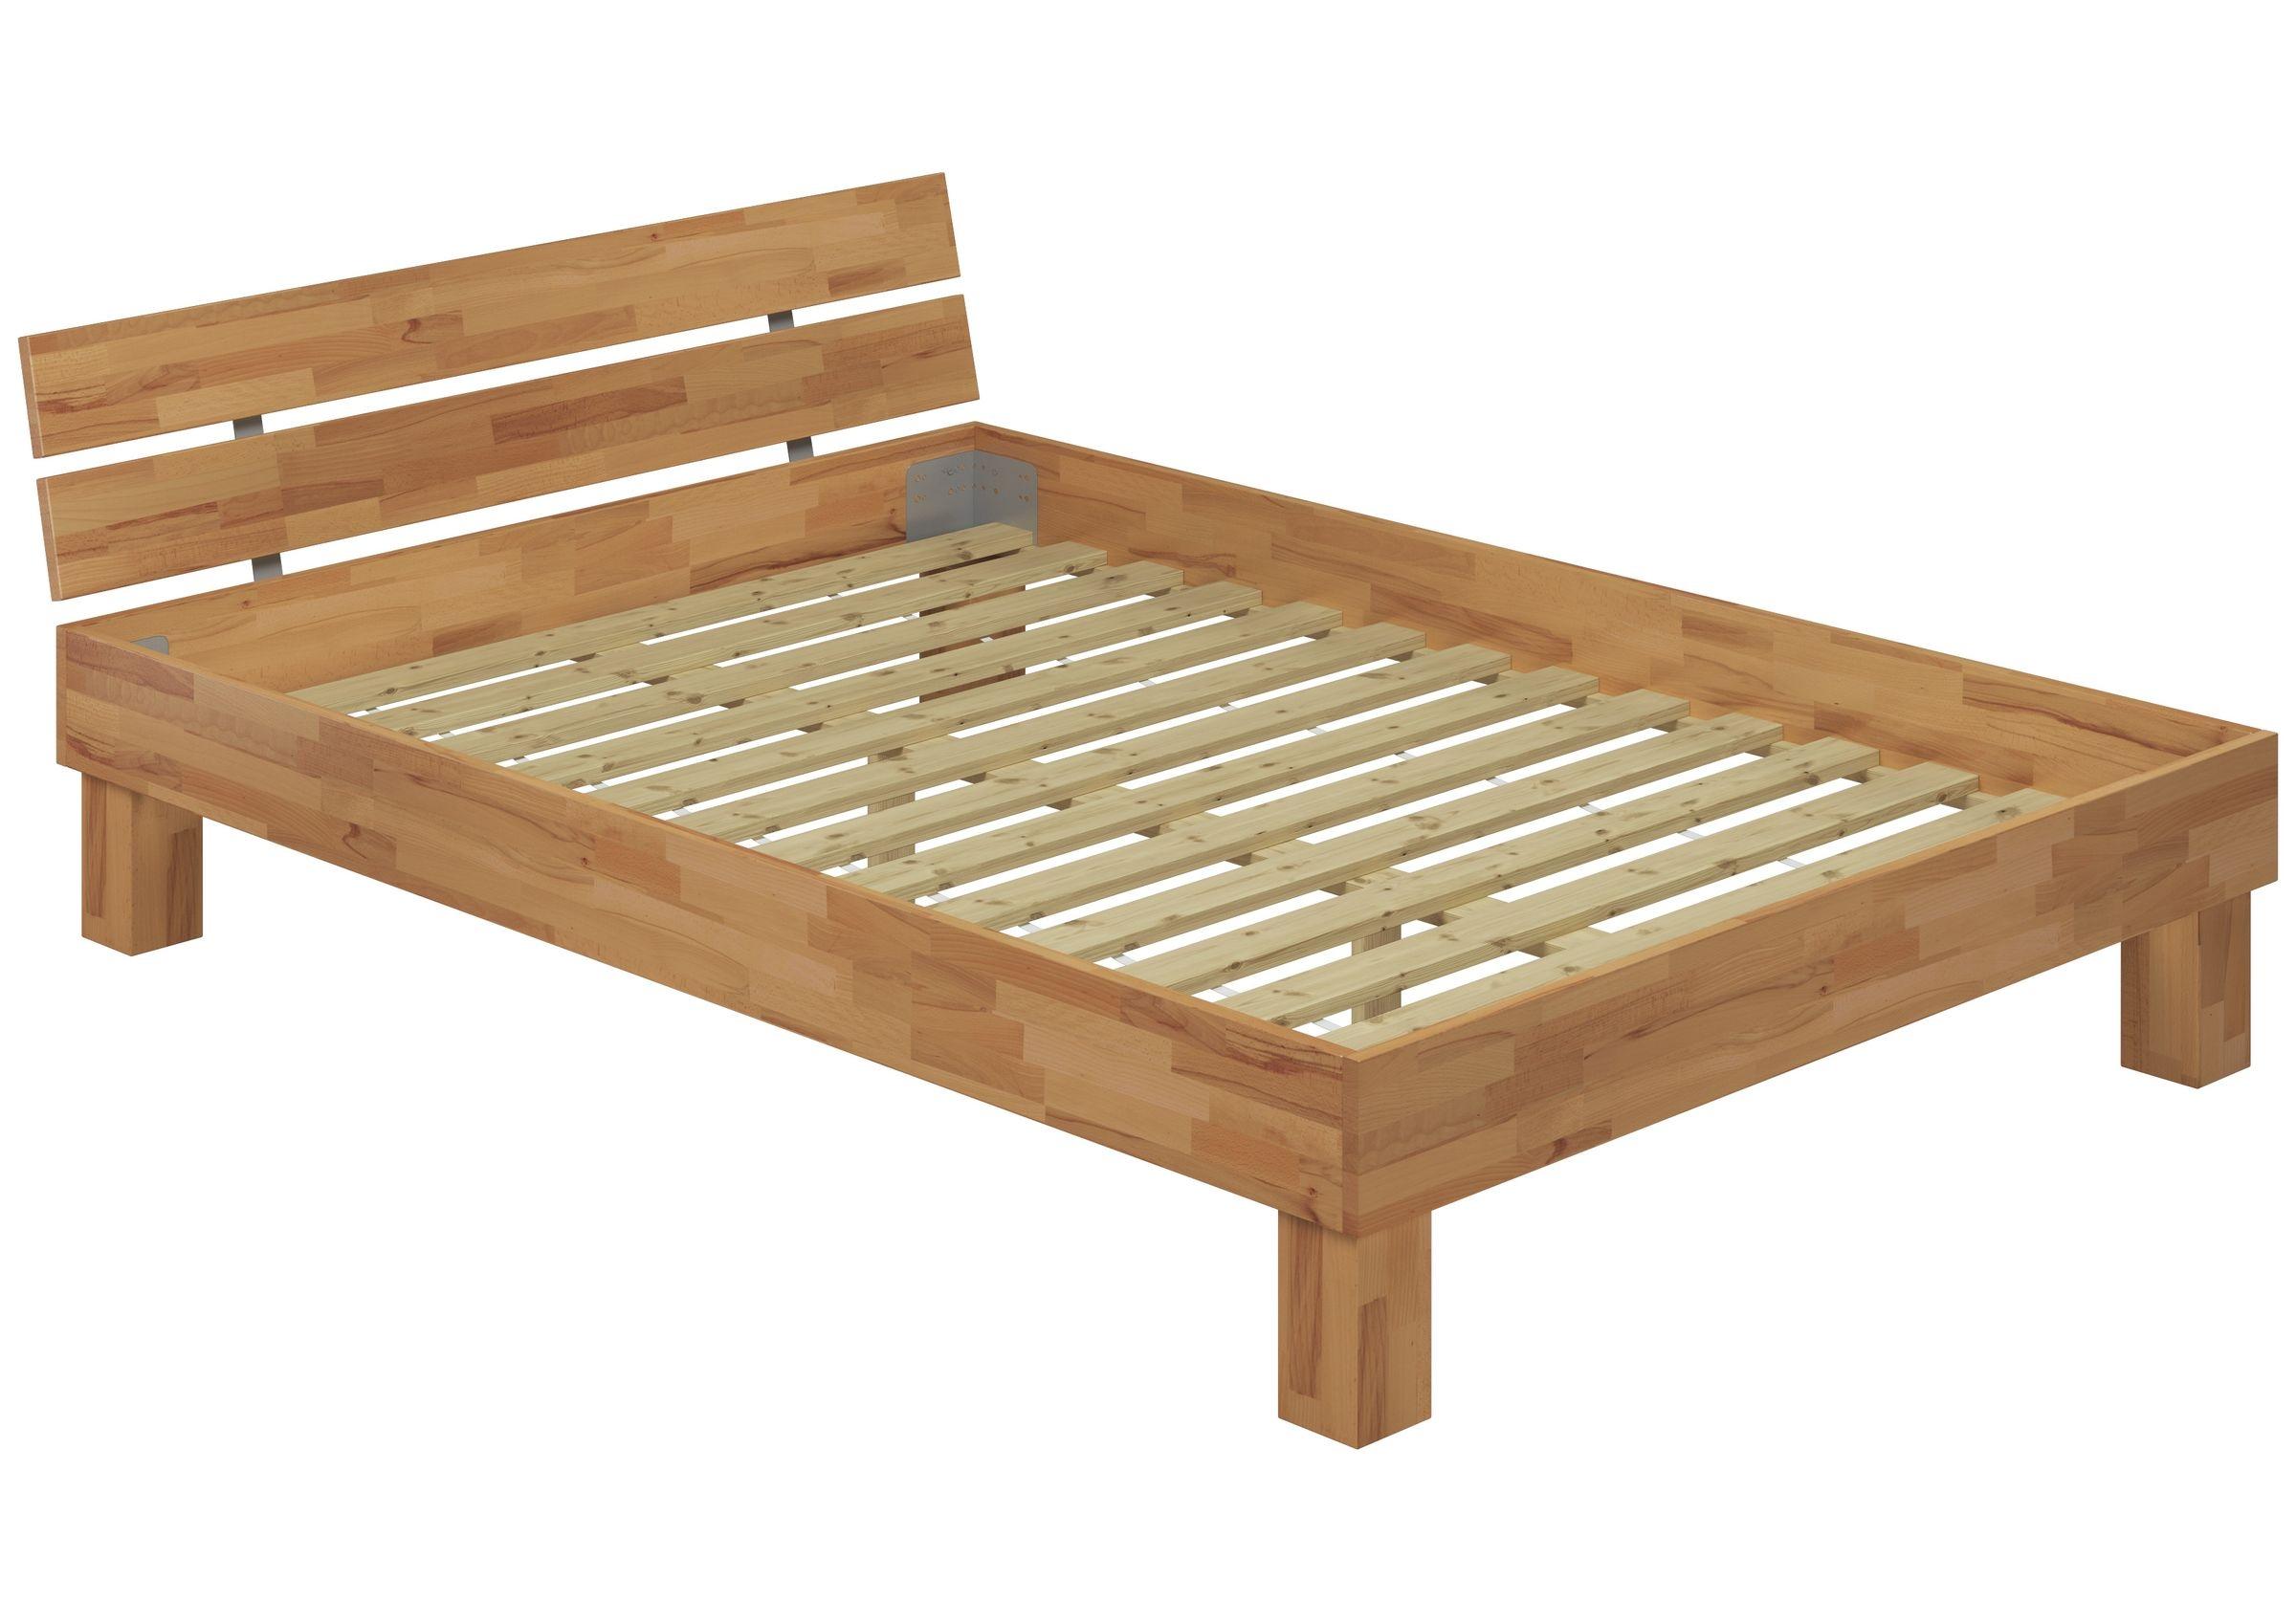 Full Size of Bett 220 X 6080 14 Buche Massivholz Natur Lackiert 140x220 Cm Grau Mit Rutsche Holz Barock Schubladen 160x200 Kaufen Günstig Nussbaum 180x200 Funktions Bett Bett 220 X 220